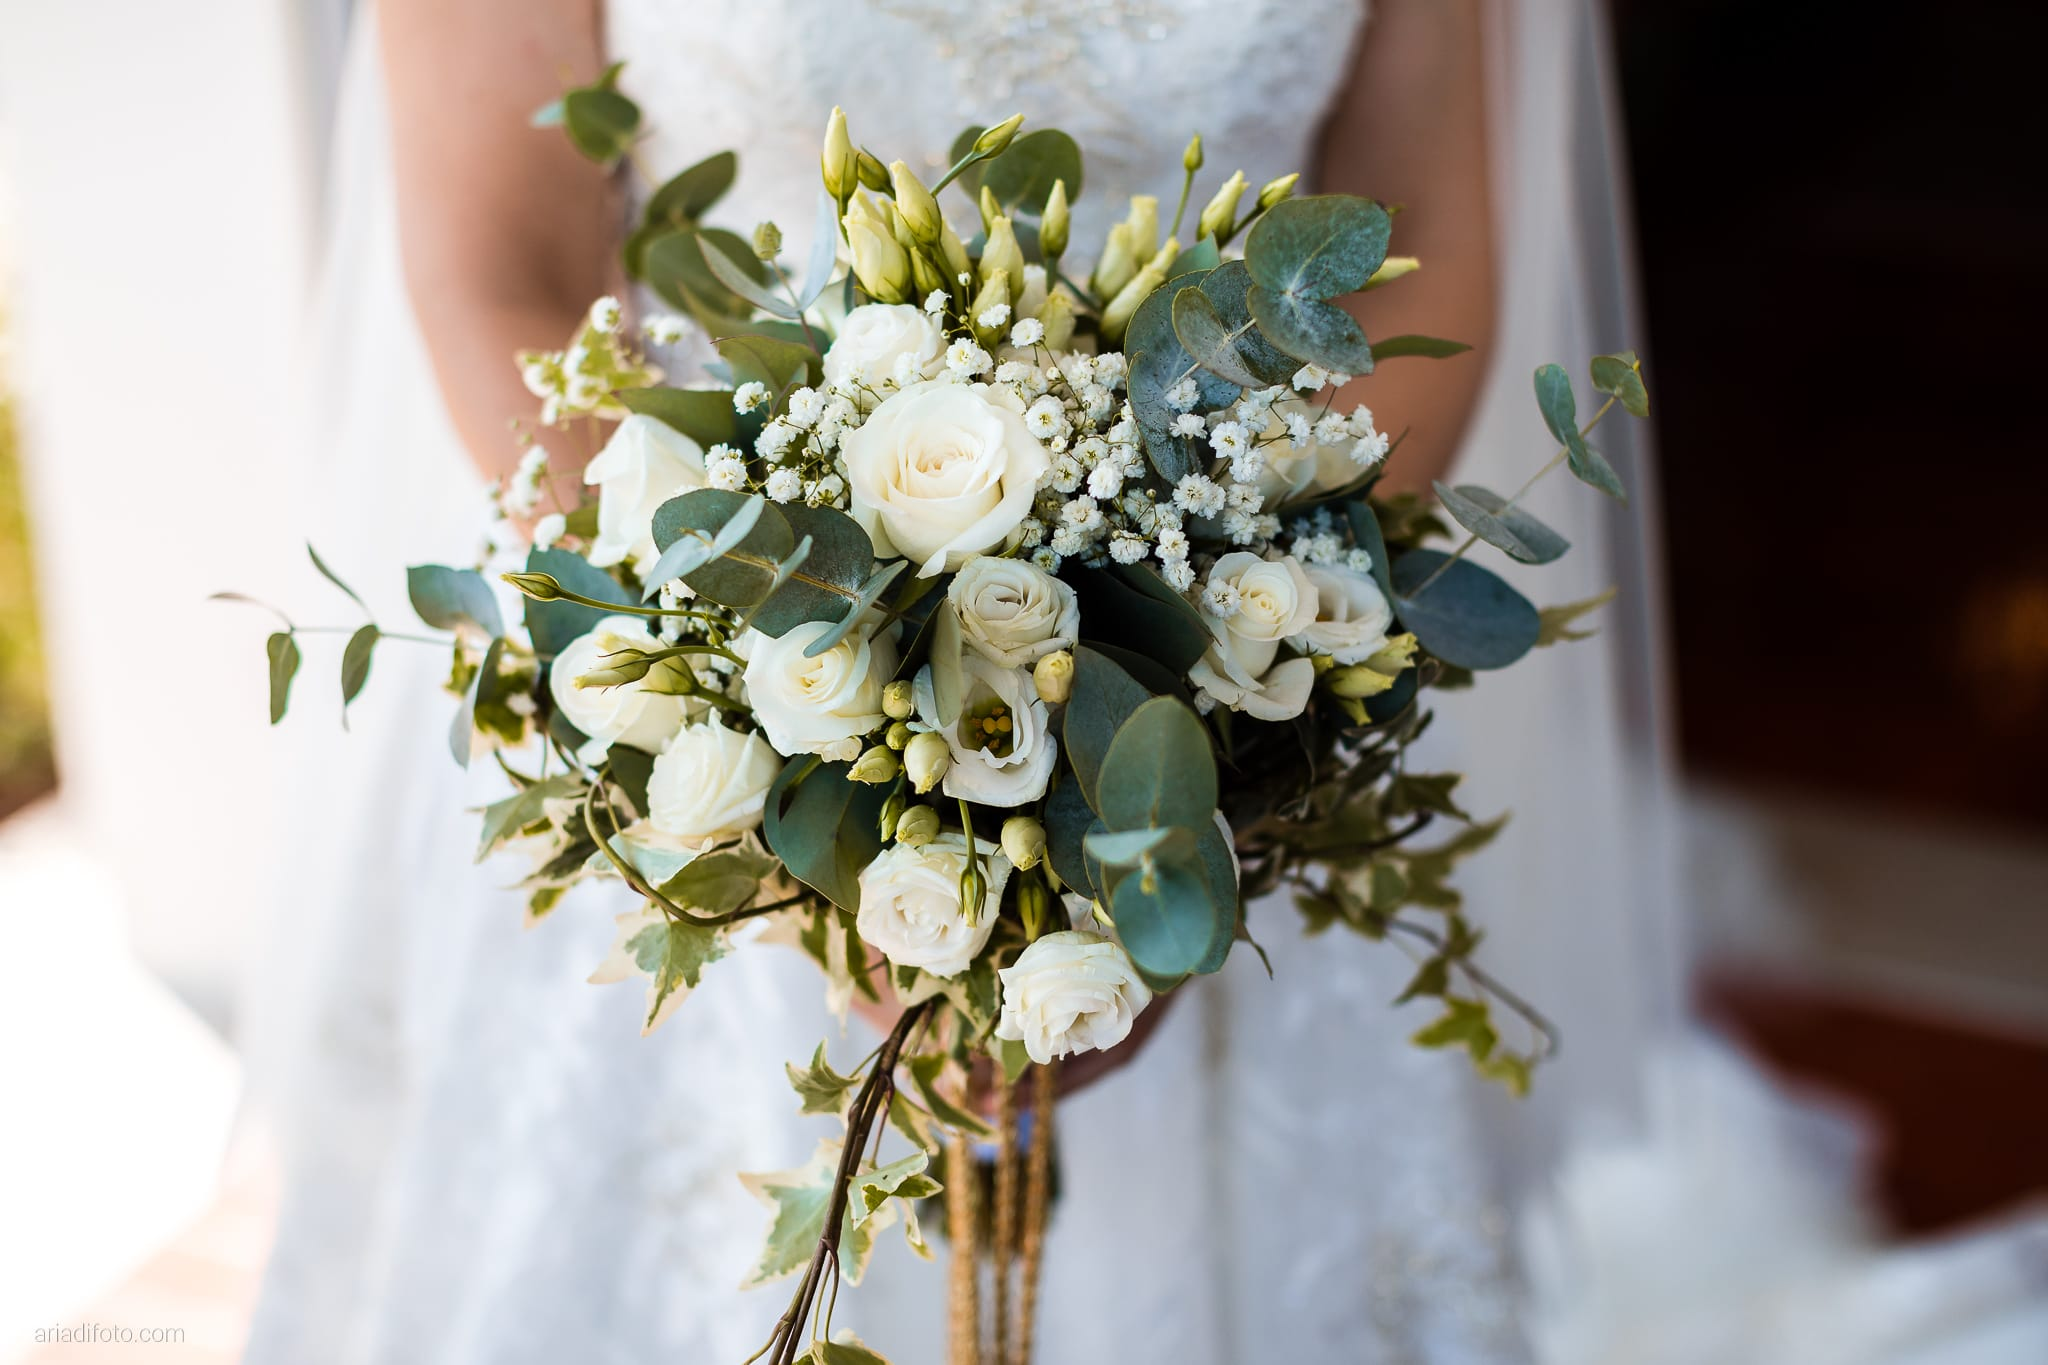 Bouquet Sposa Carta Da Zucchero.Rachele Martino Matrimonio A Treviso Www Ariadifoto Com